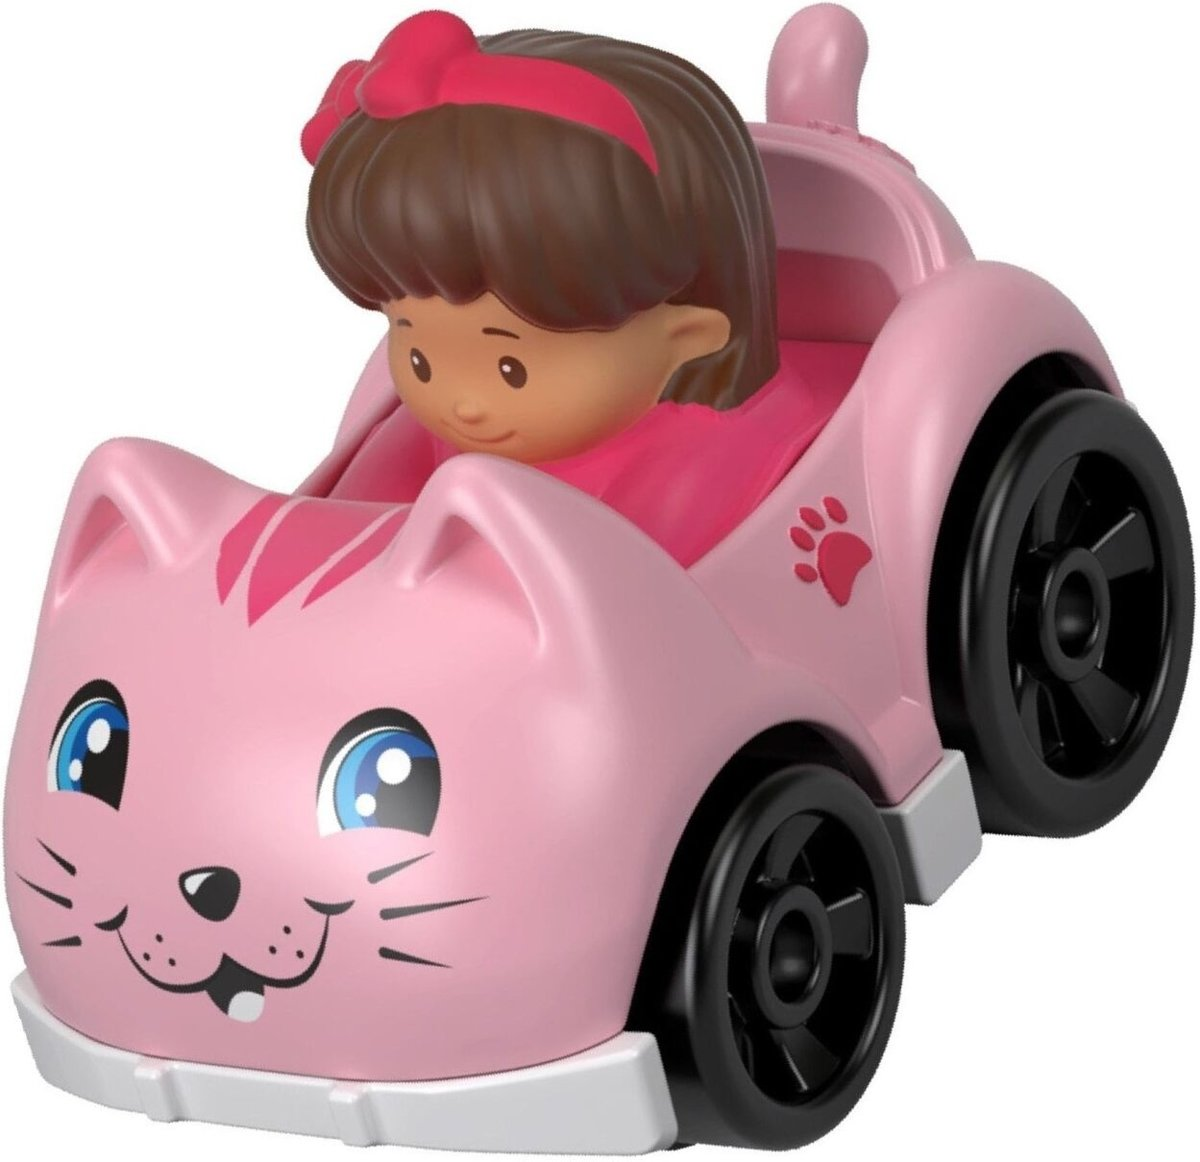 Fisher-price Little People Wheelies Auto 6,5 Cm Roze (fhb96)